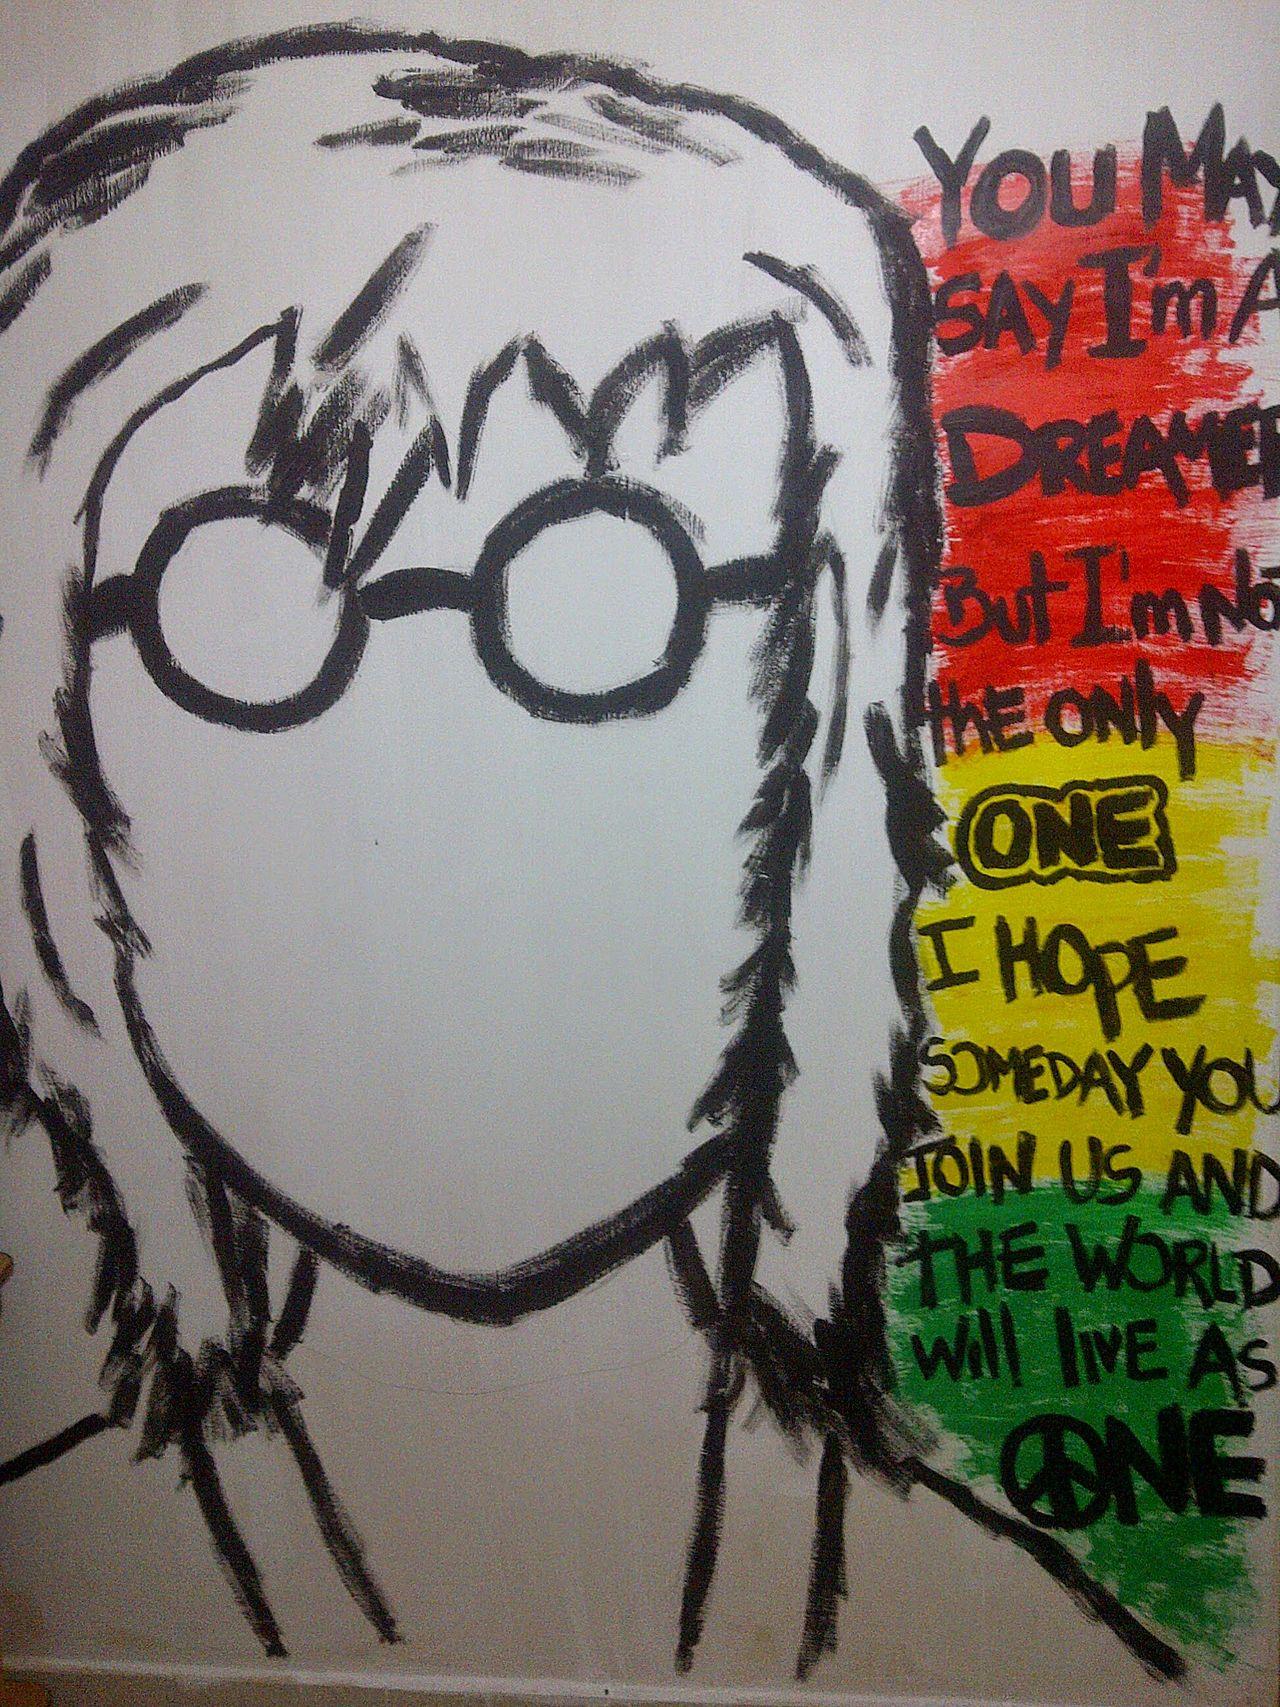 Text No People Close-up Day Wallpainting Designattack Beatles Outdoors TheBeatles😍😍😍 Painted MadebyMe ☝✌ MyWallArt Ecuador🇪🇨